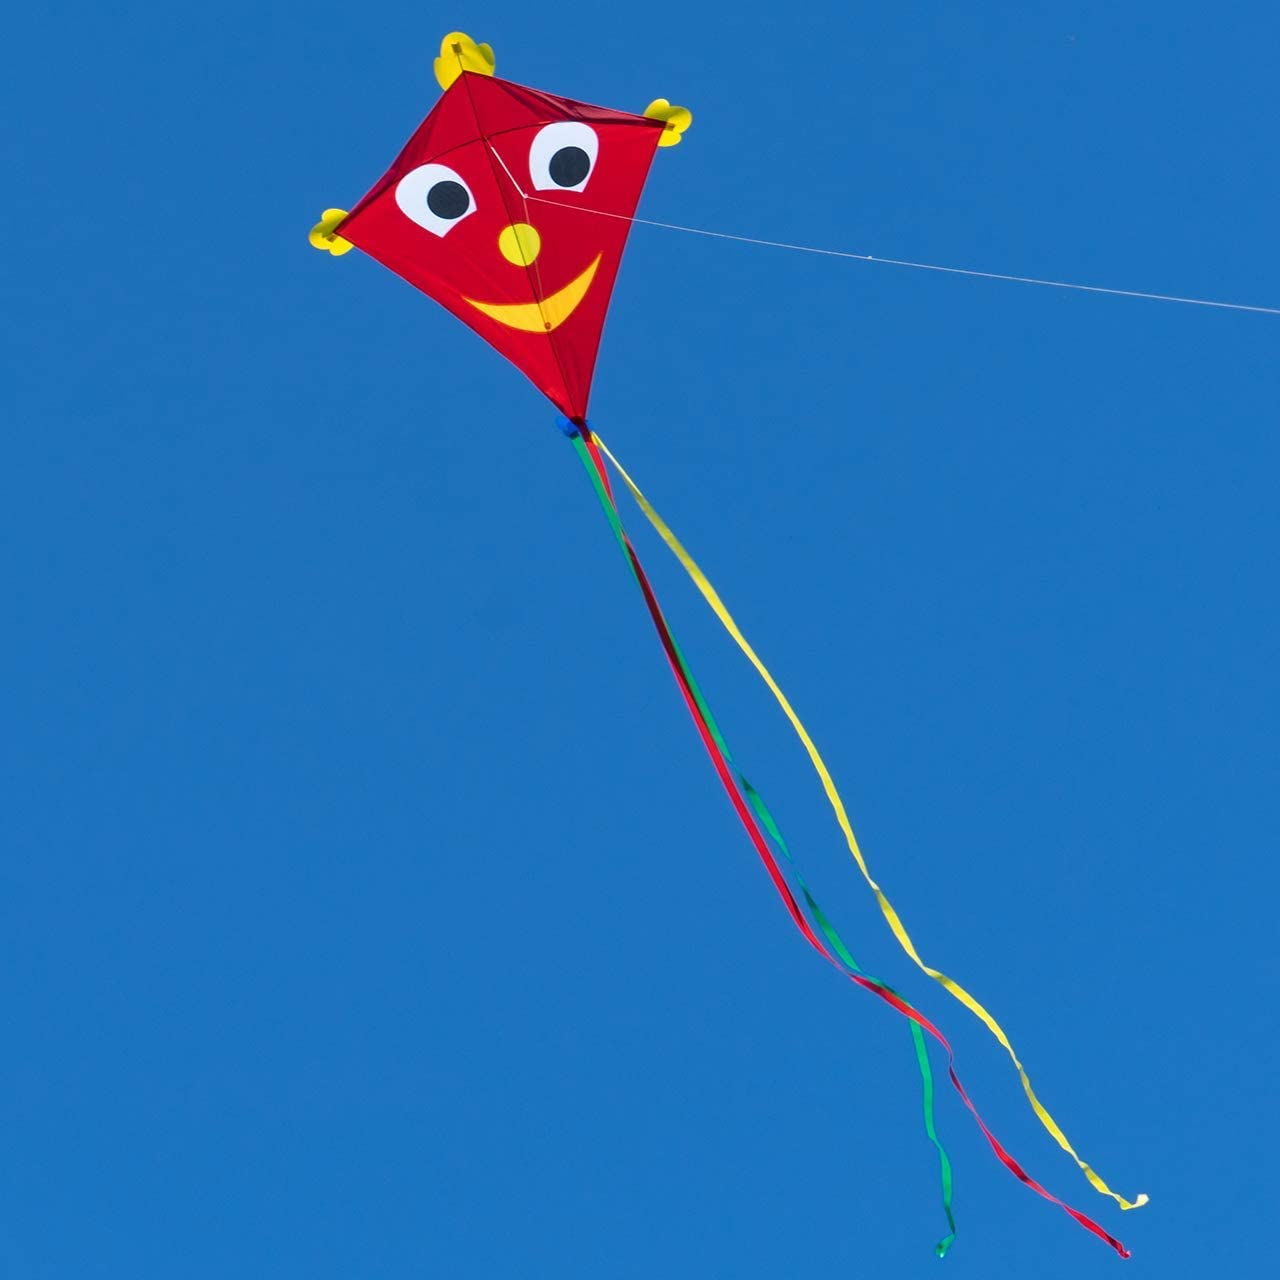 102x108cm single-line kite for children aged 6 and older SUPER KITE Happy Eddy XL including 80m line and stripe tails CIM Big kite for kids